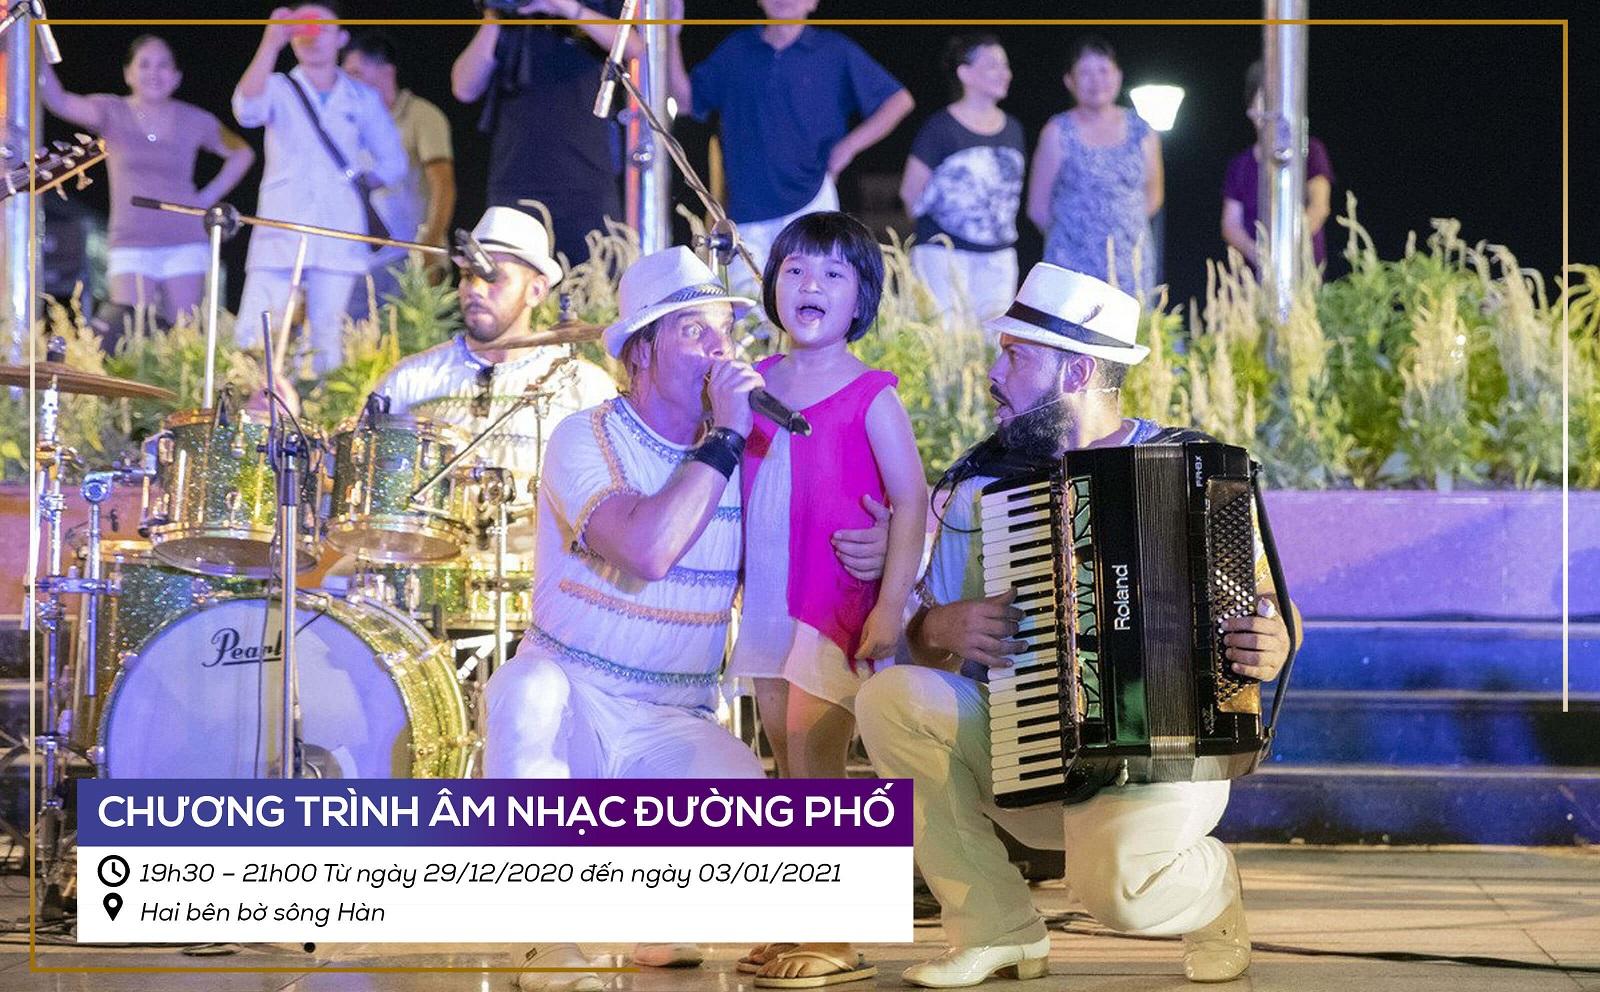 Le Hoi Da Nang Chao Nam Moi 2021 Chuong Trinh Am Nhac Duong Pho